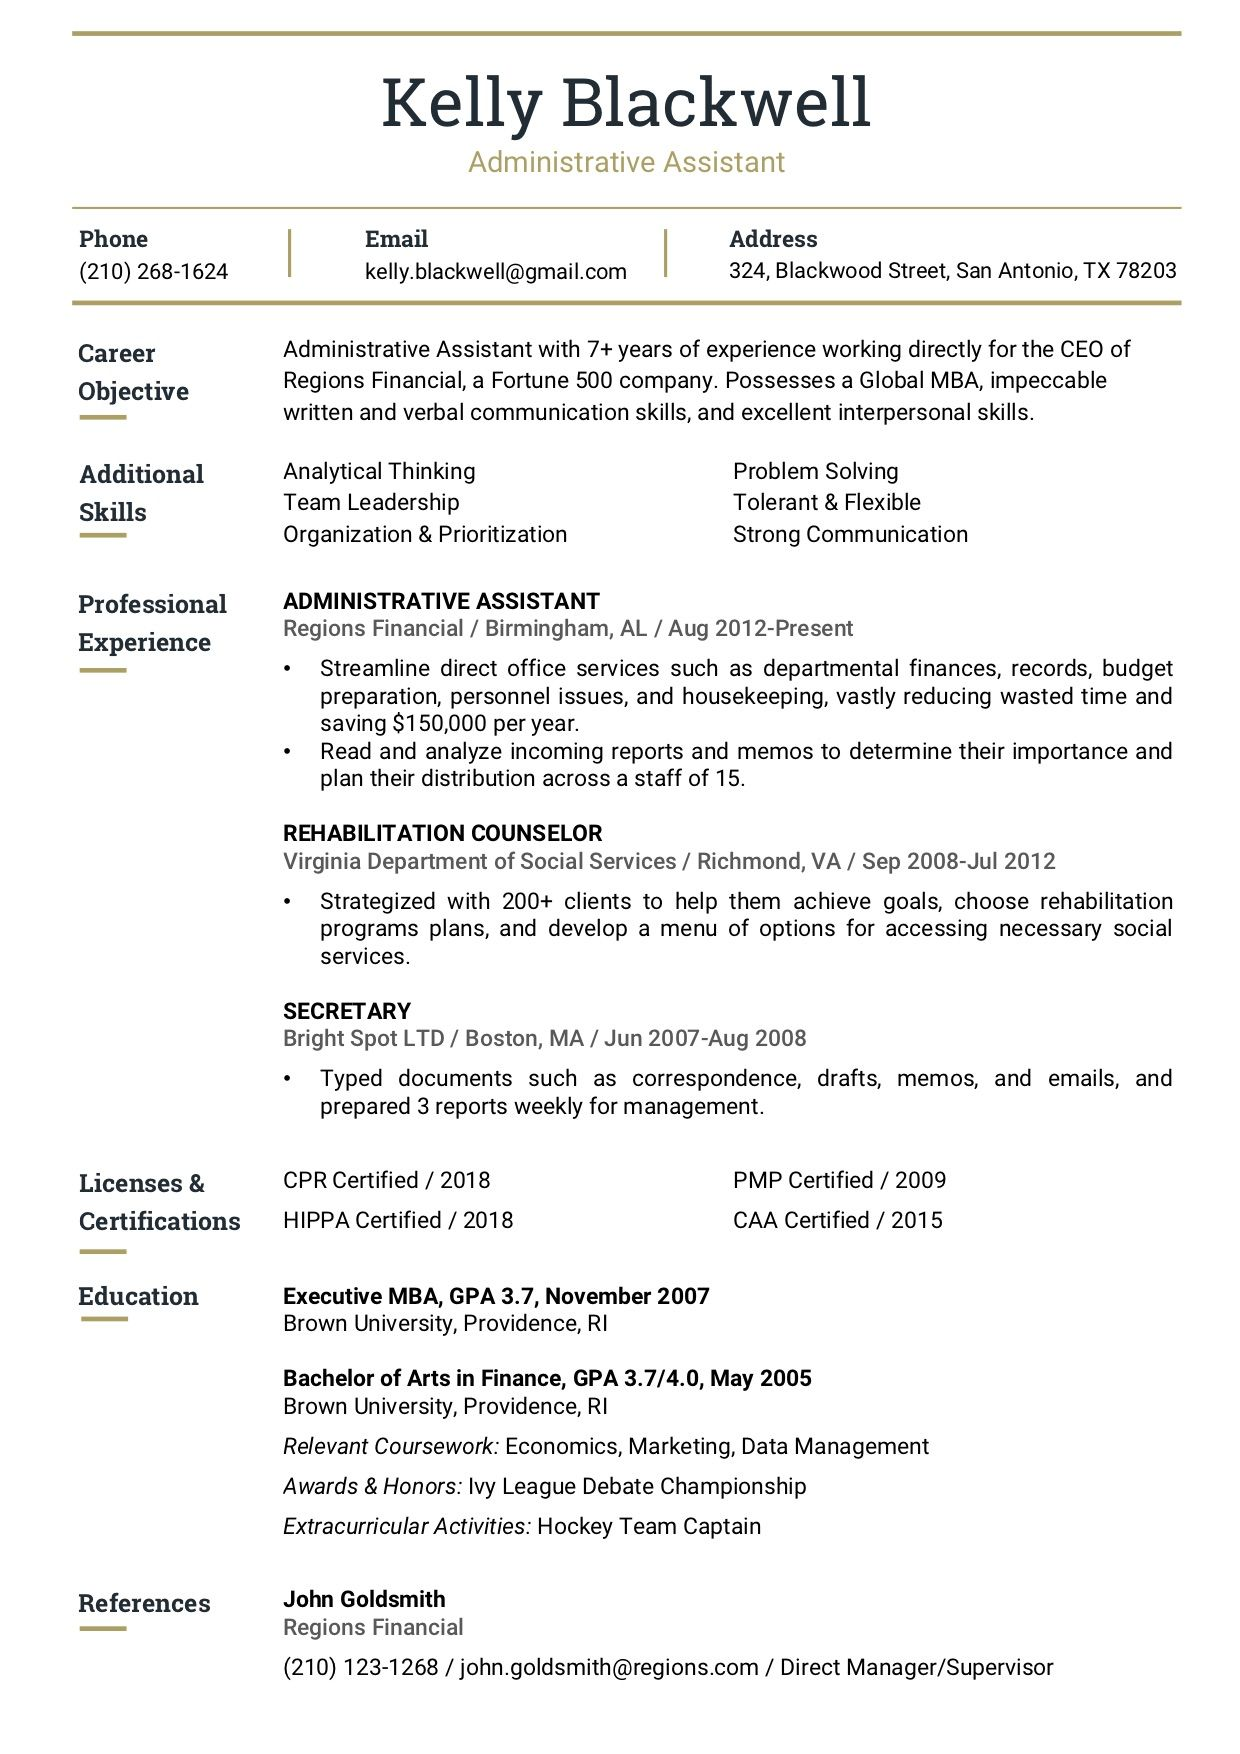 Resume Template 7a Rc Resume Template Resume Template Word Resume Templates